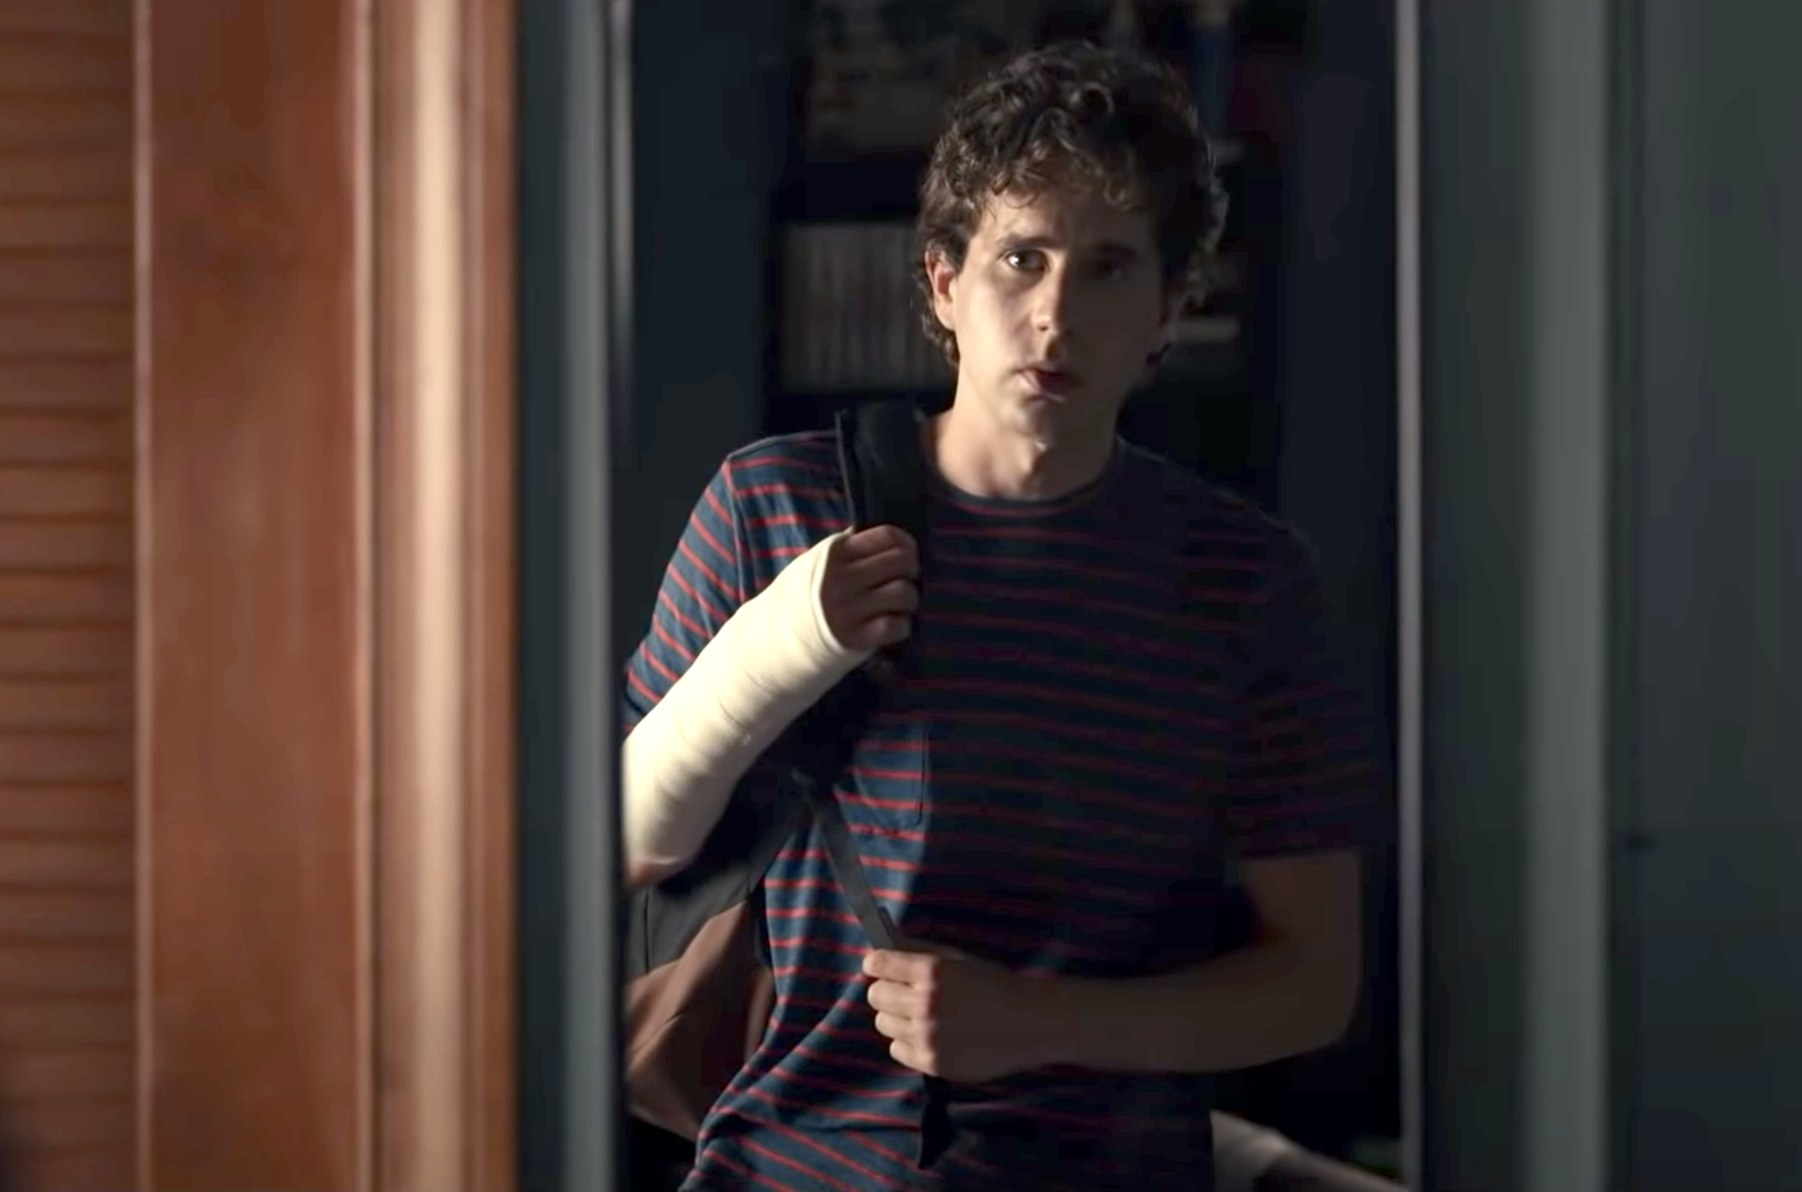 A screenshot of Ben in the movie